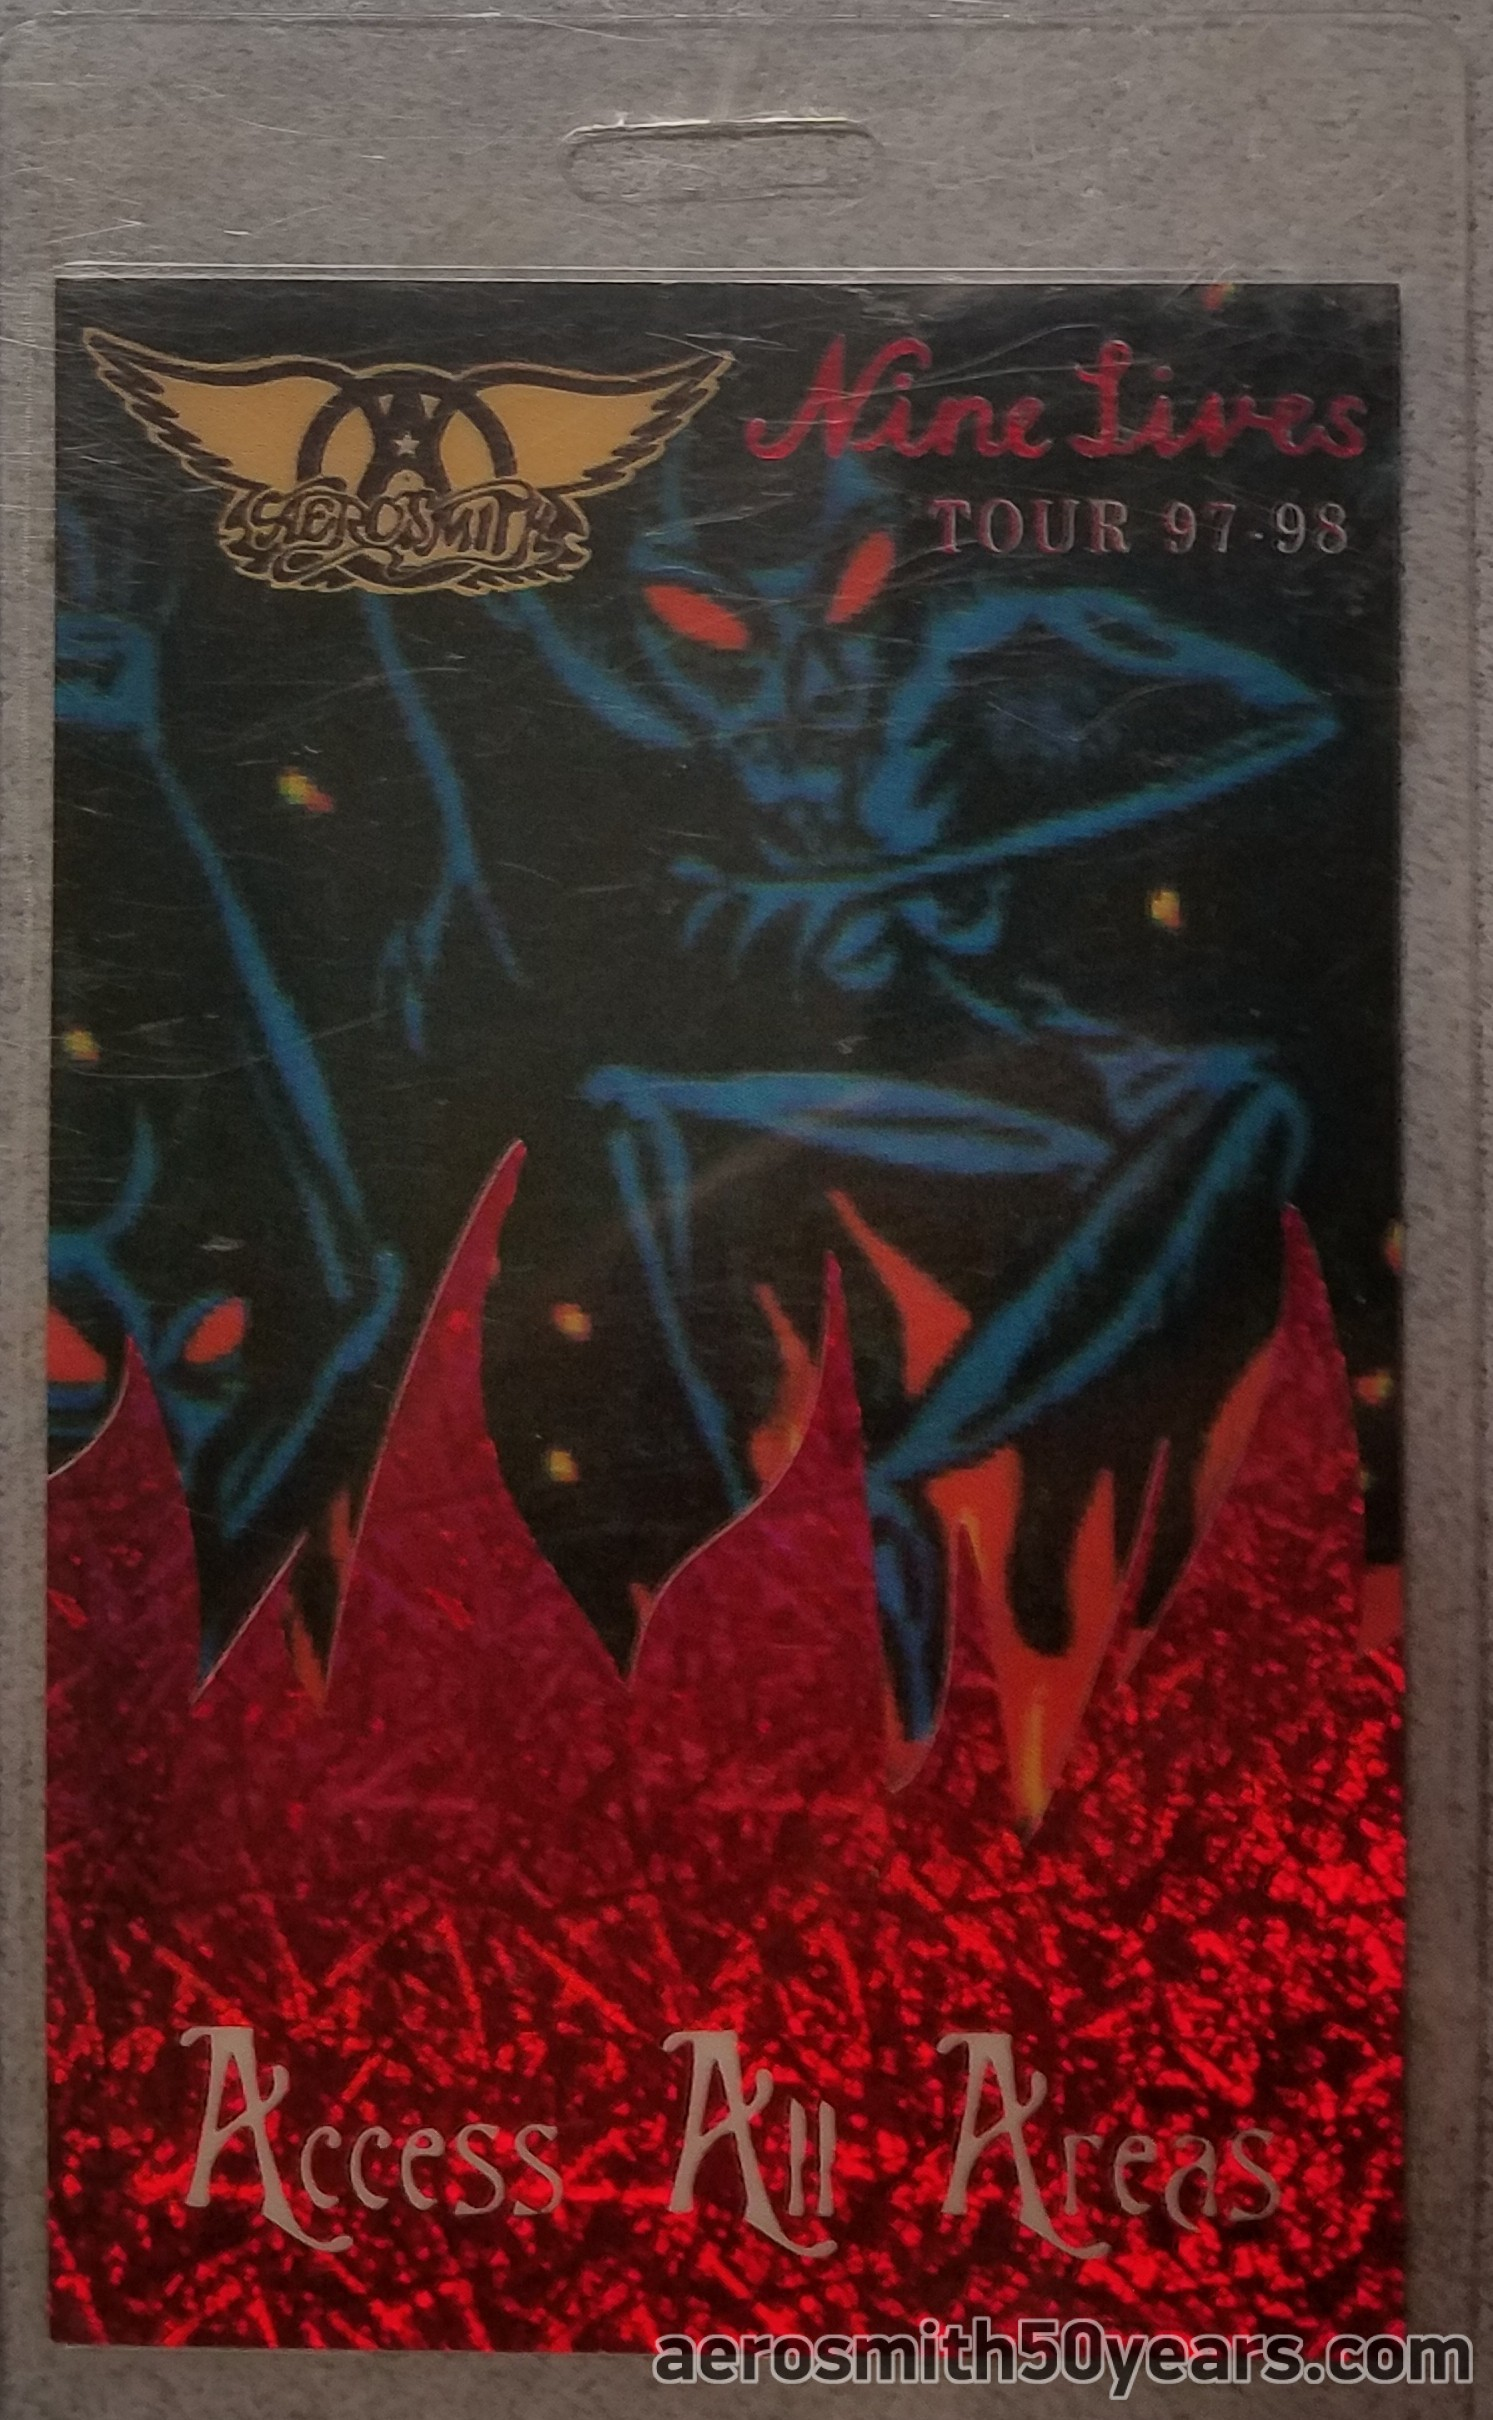 Nine Lives- 1997-98 Access All Areas Tour Laminate